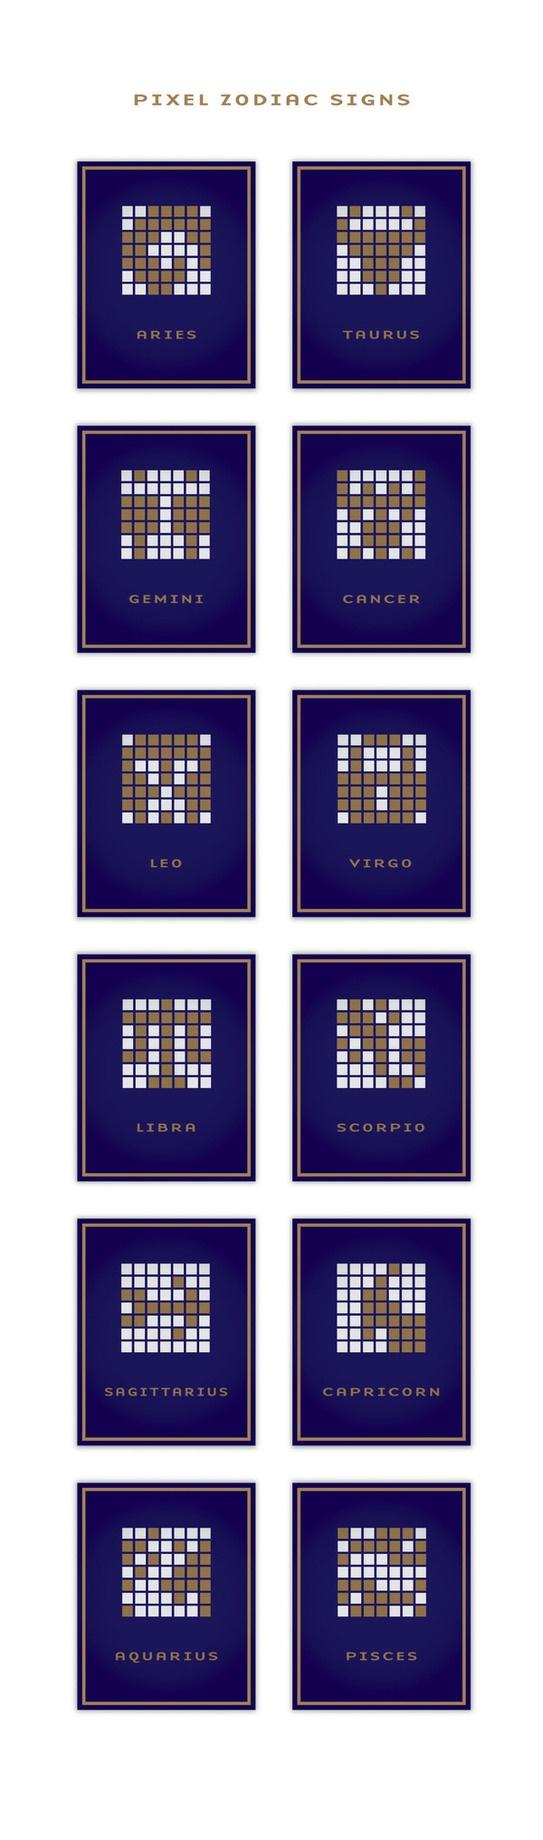 pixel zodiac signs by Laszlo Sandor, via Behance